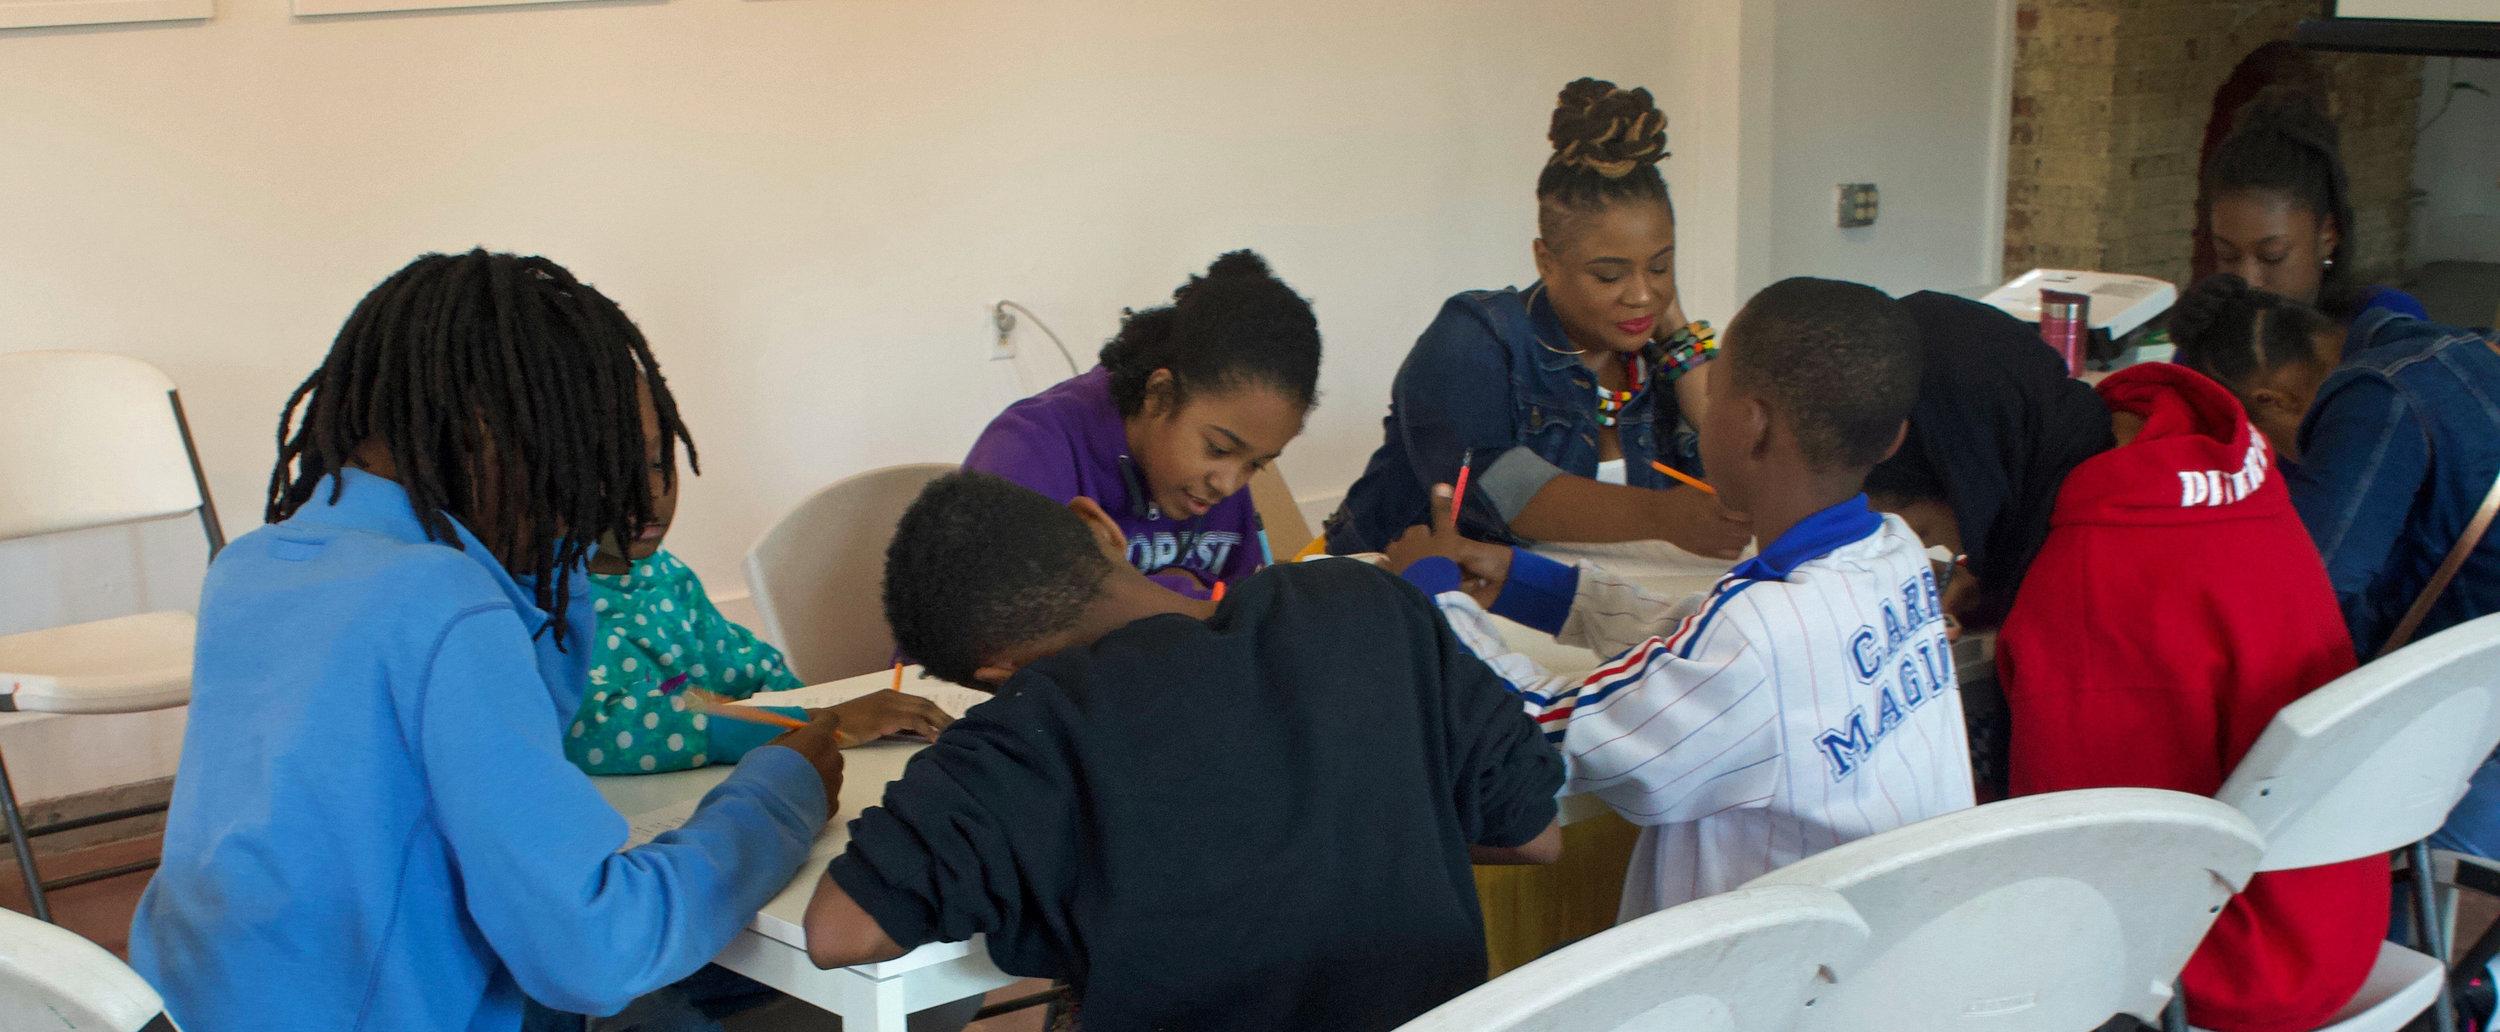 WTNN Literacy workshop led by Josie Pickens, Photo by Nathaniel Donnett